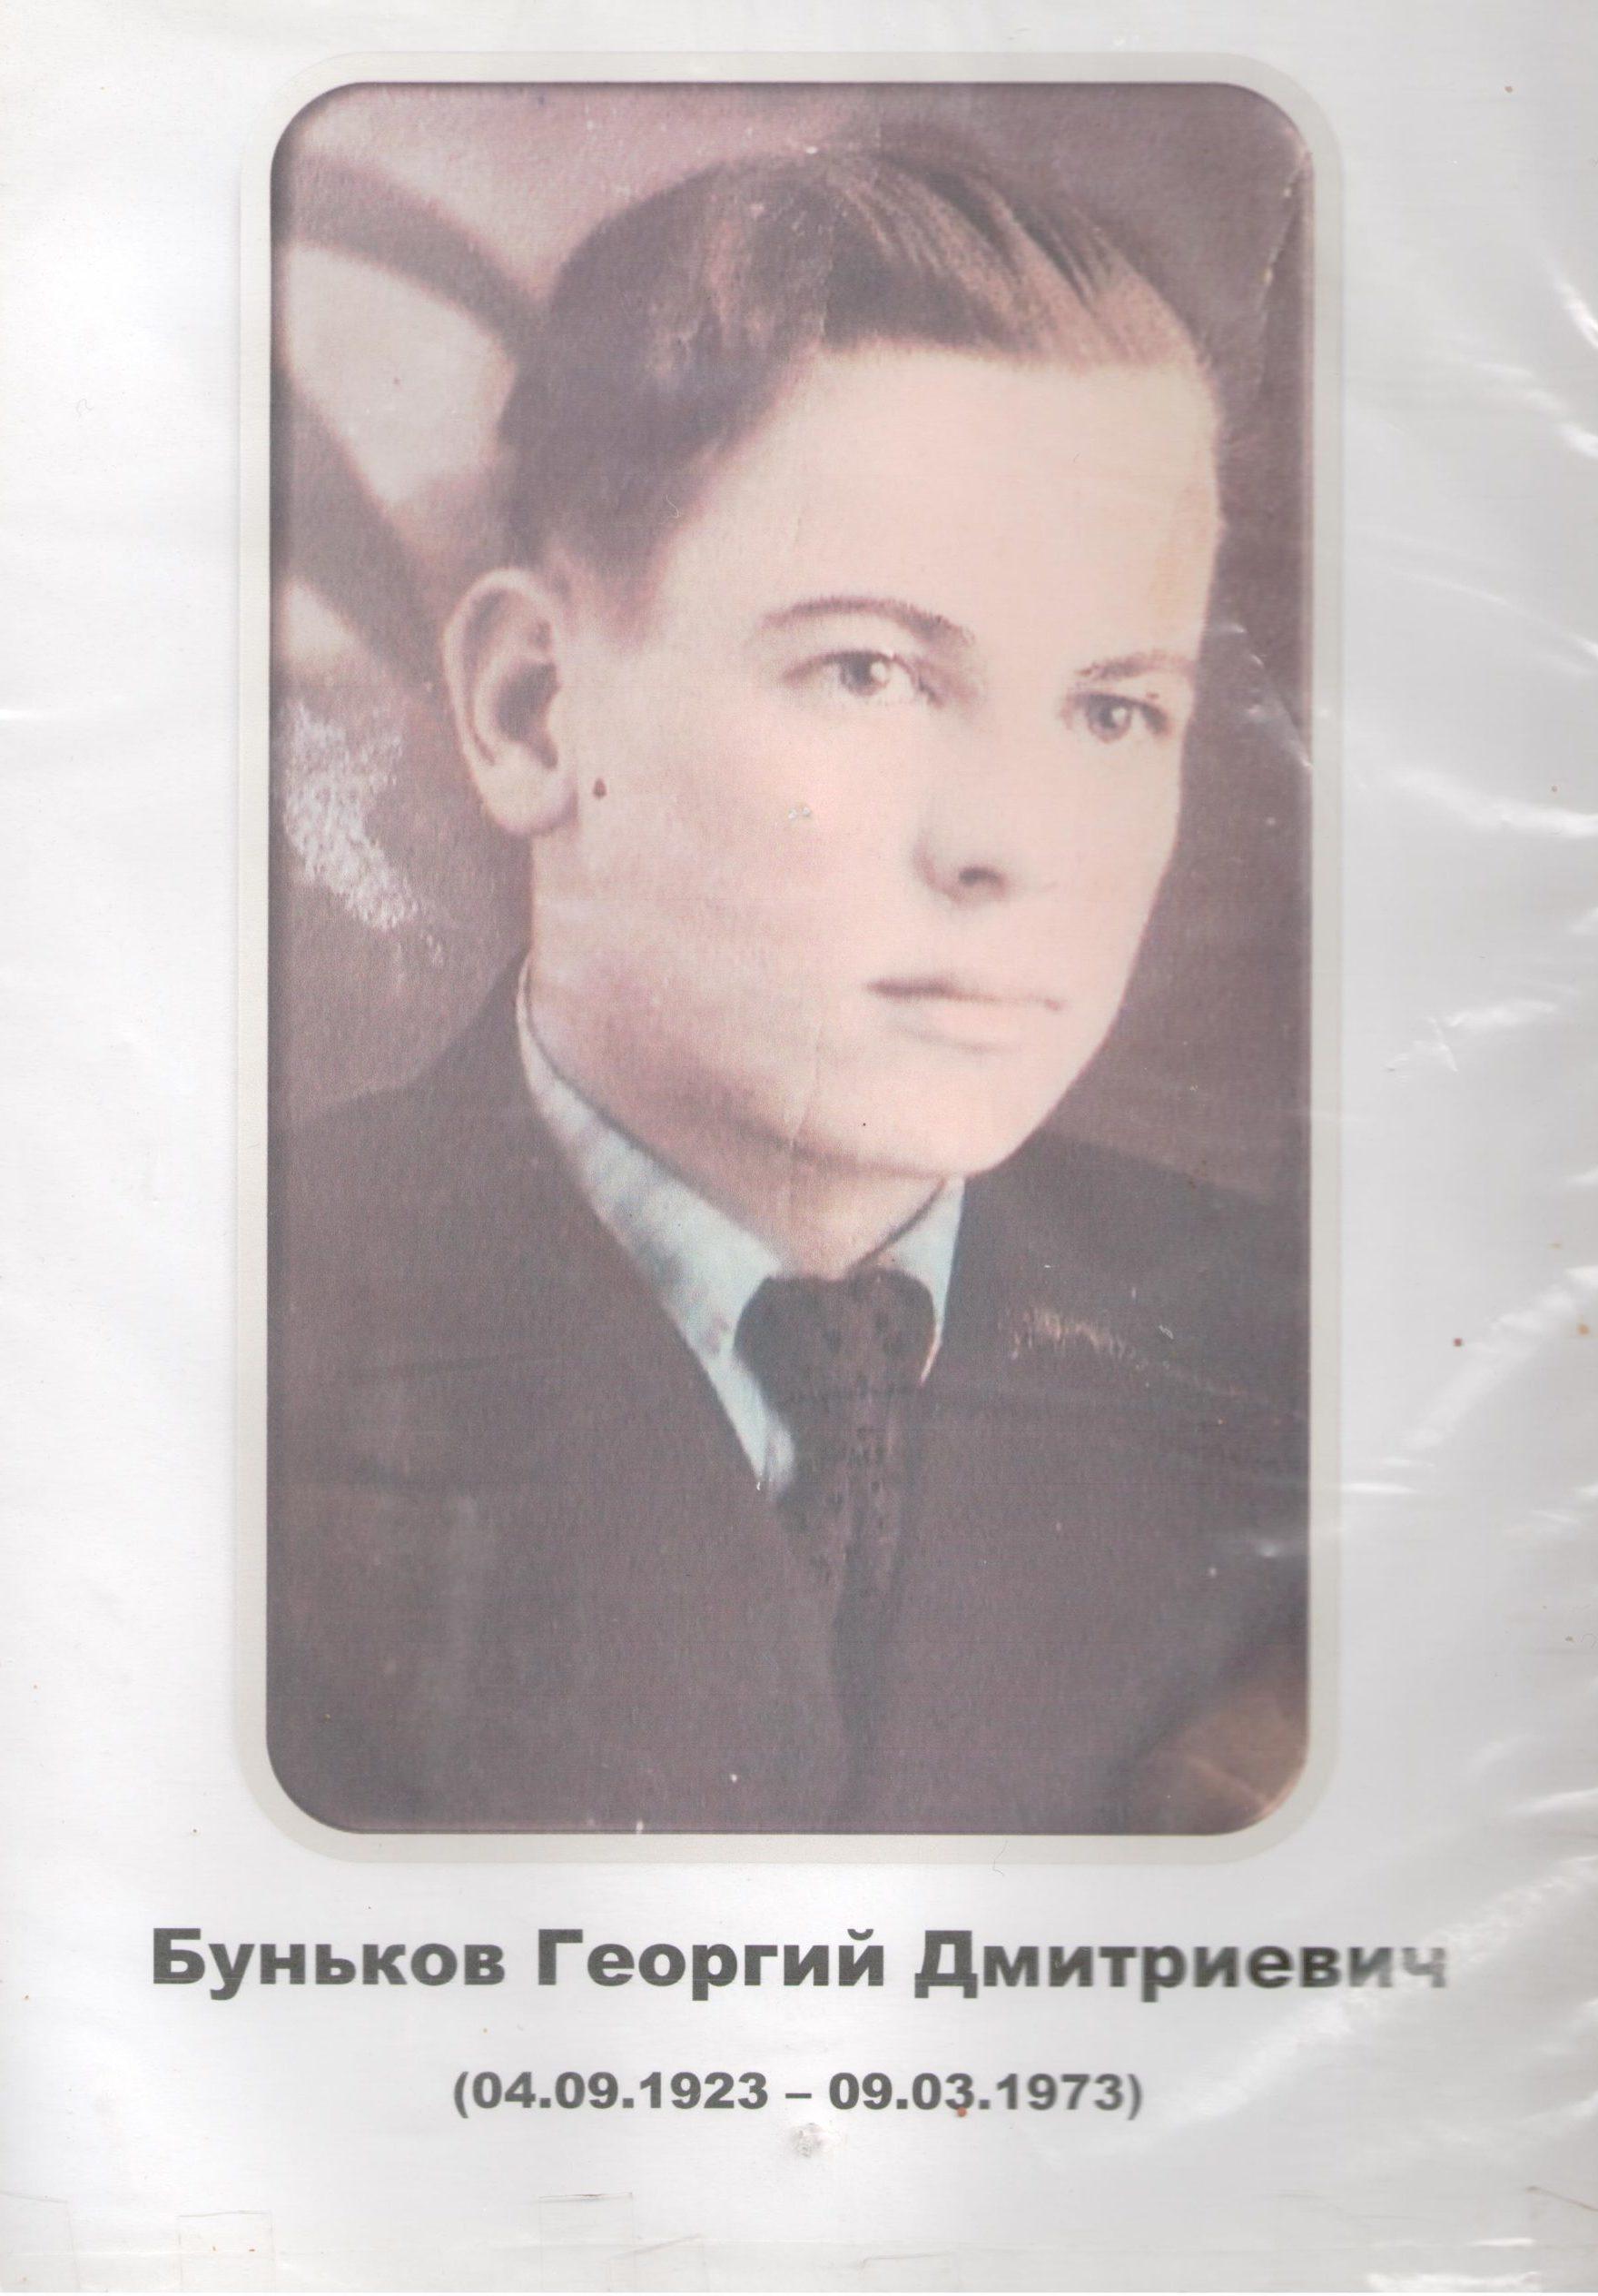 Буньков Георгий Дмитриевич